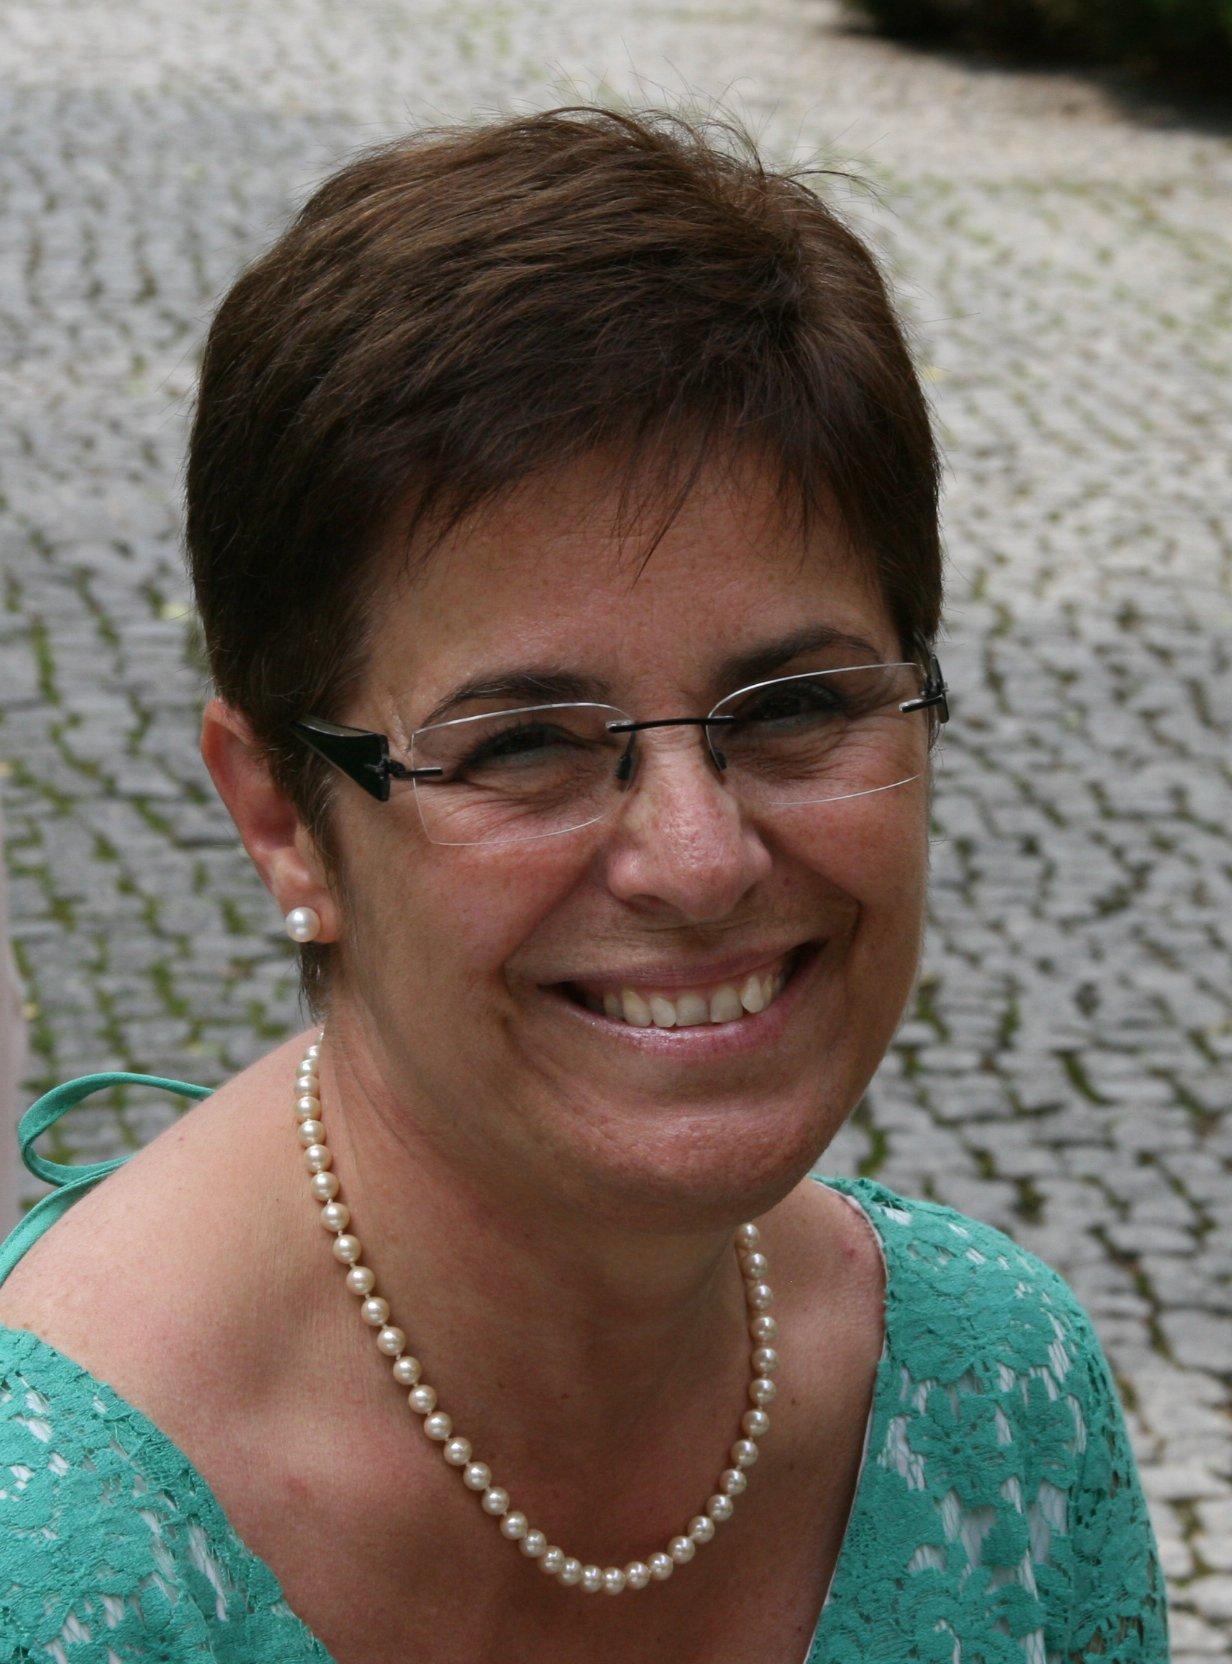 Luisa Peretti